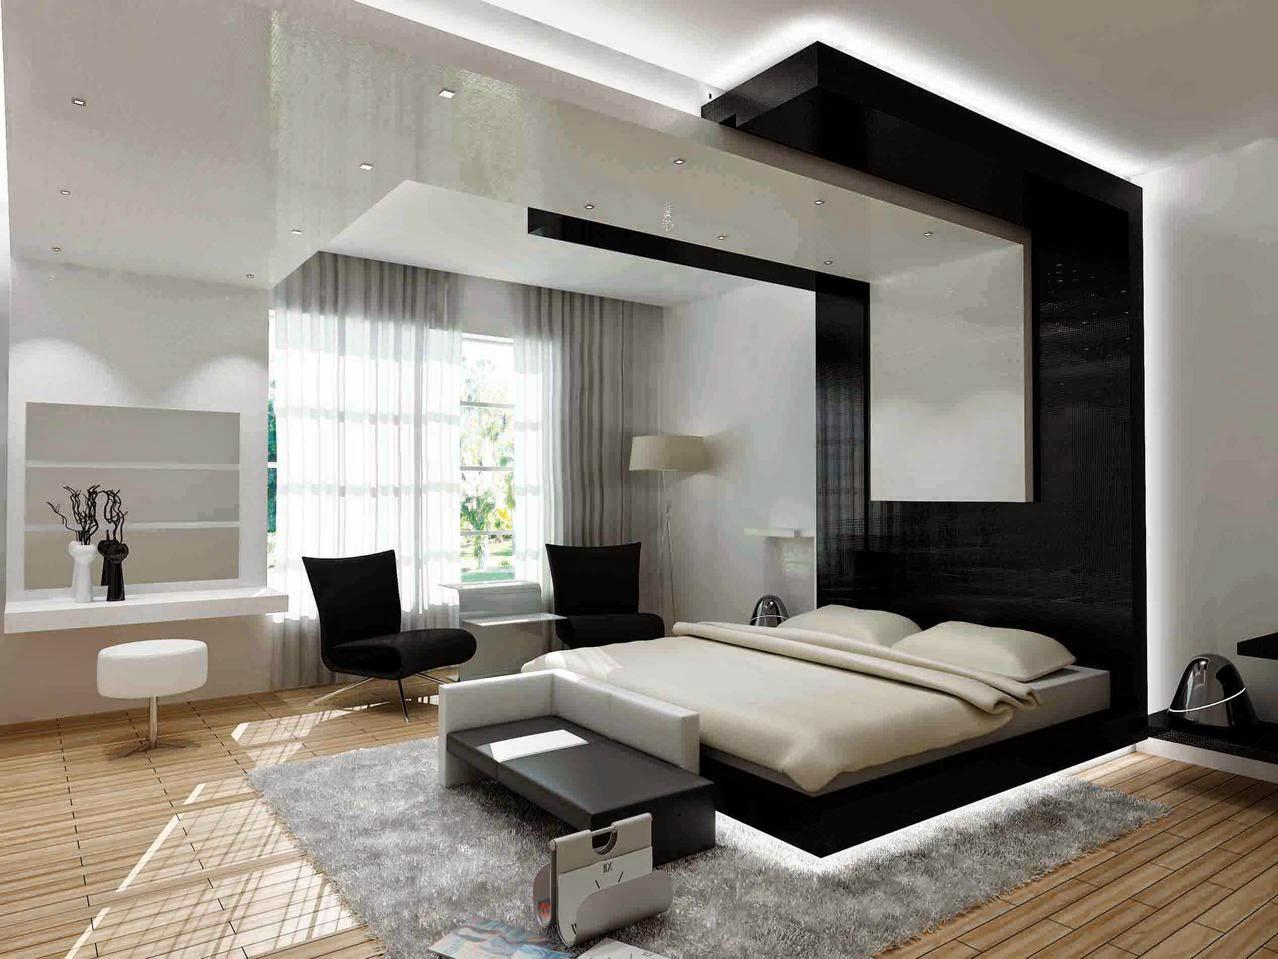 Chambre Moderne Chambre A Decorer Pour Petite Idee Dado Photos